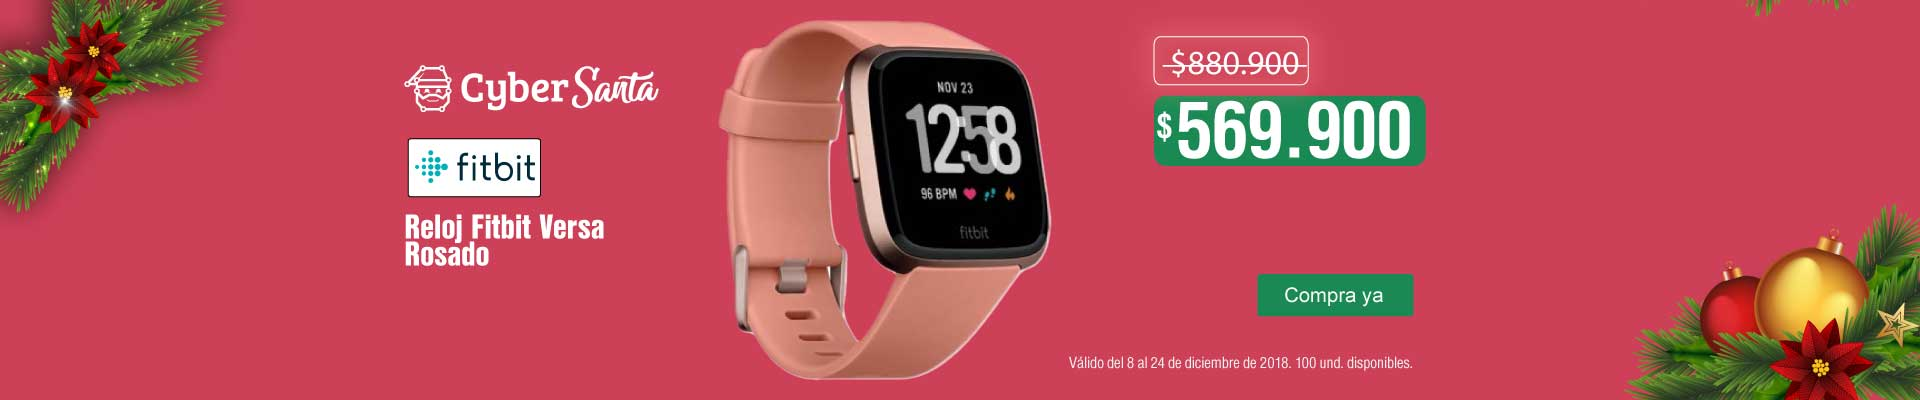 AK-KT-PPAL-LANDING-6-ACC-PP-FITBIT-Versa Smartwatch Peach-Rose Gold Aluminum-DICIEMBRE-12